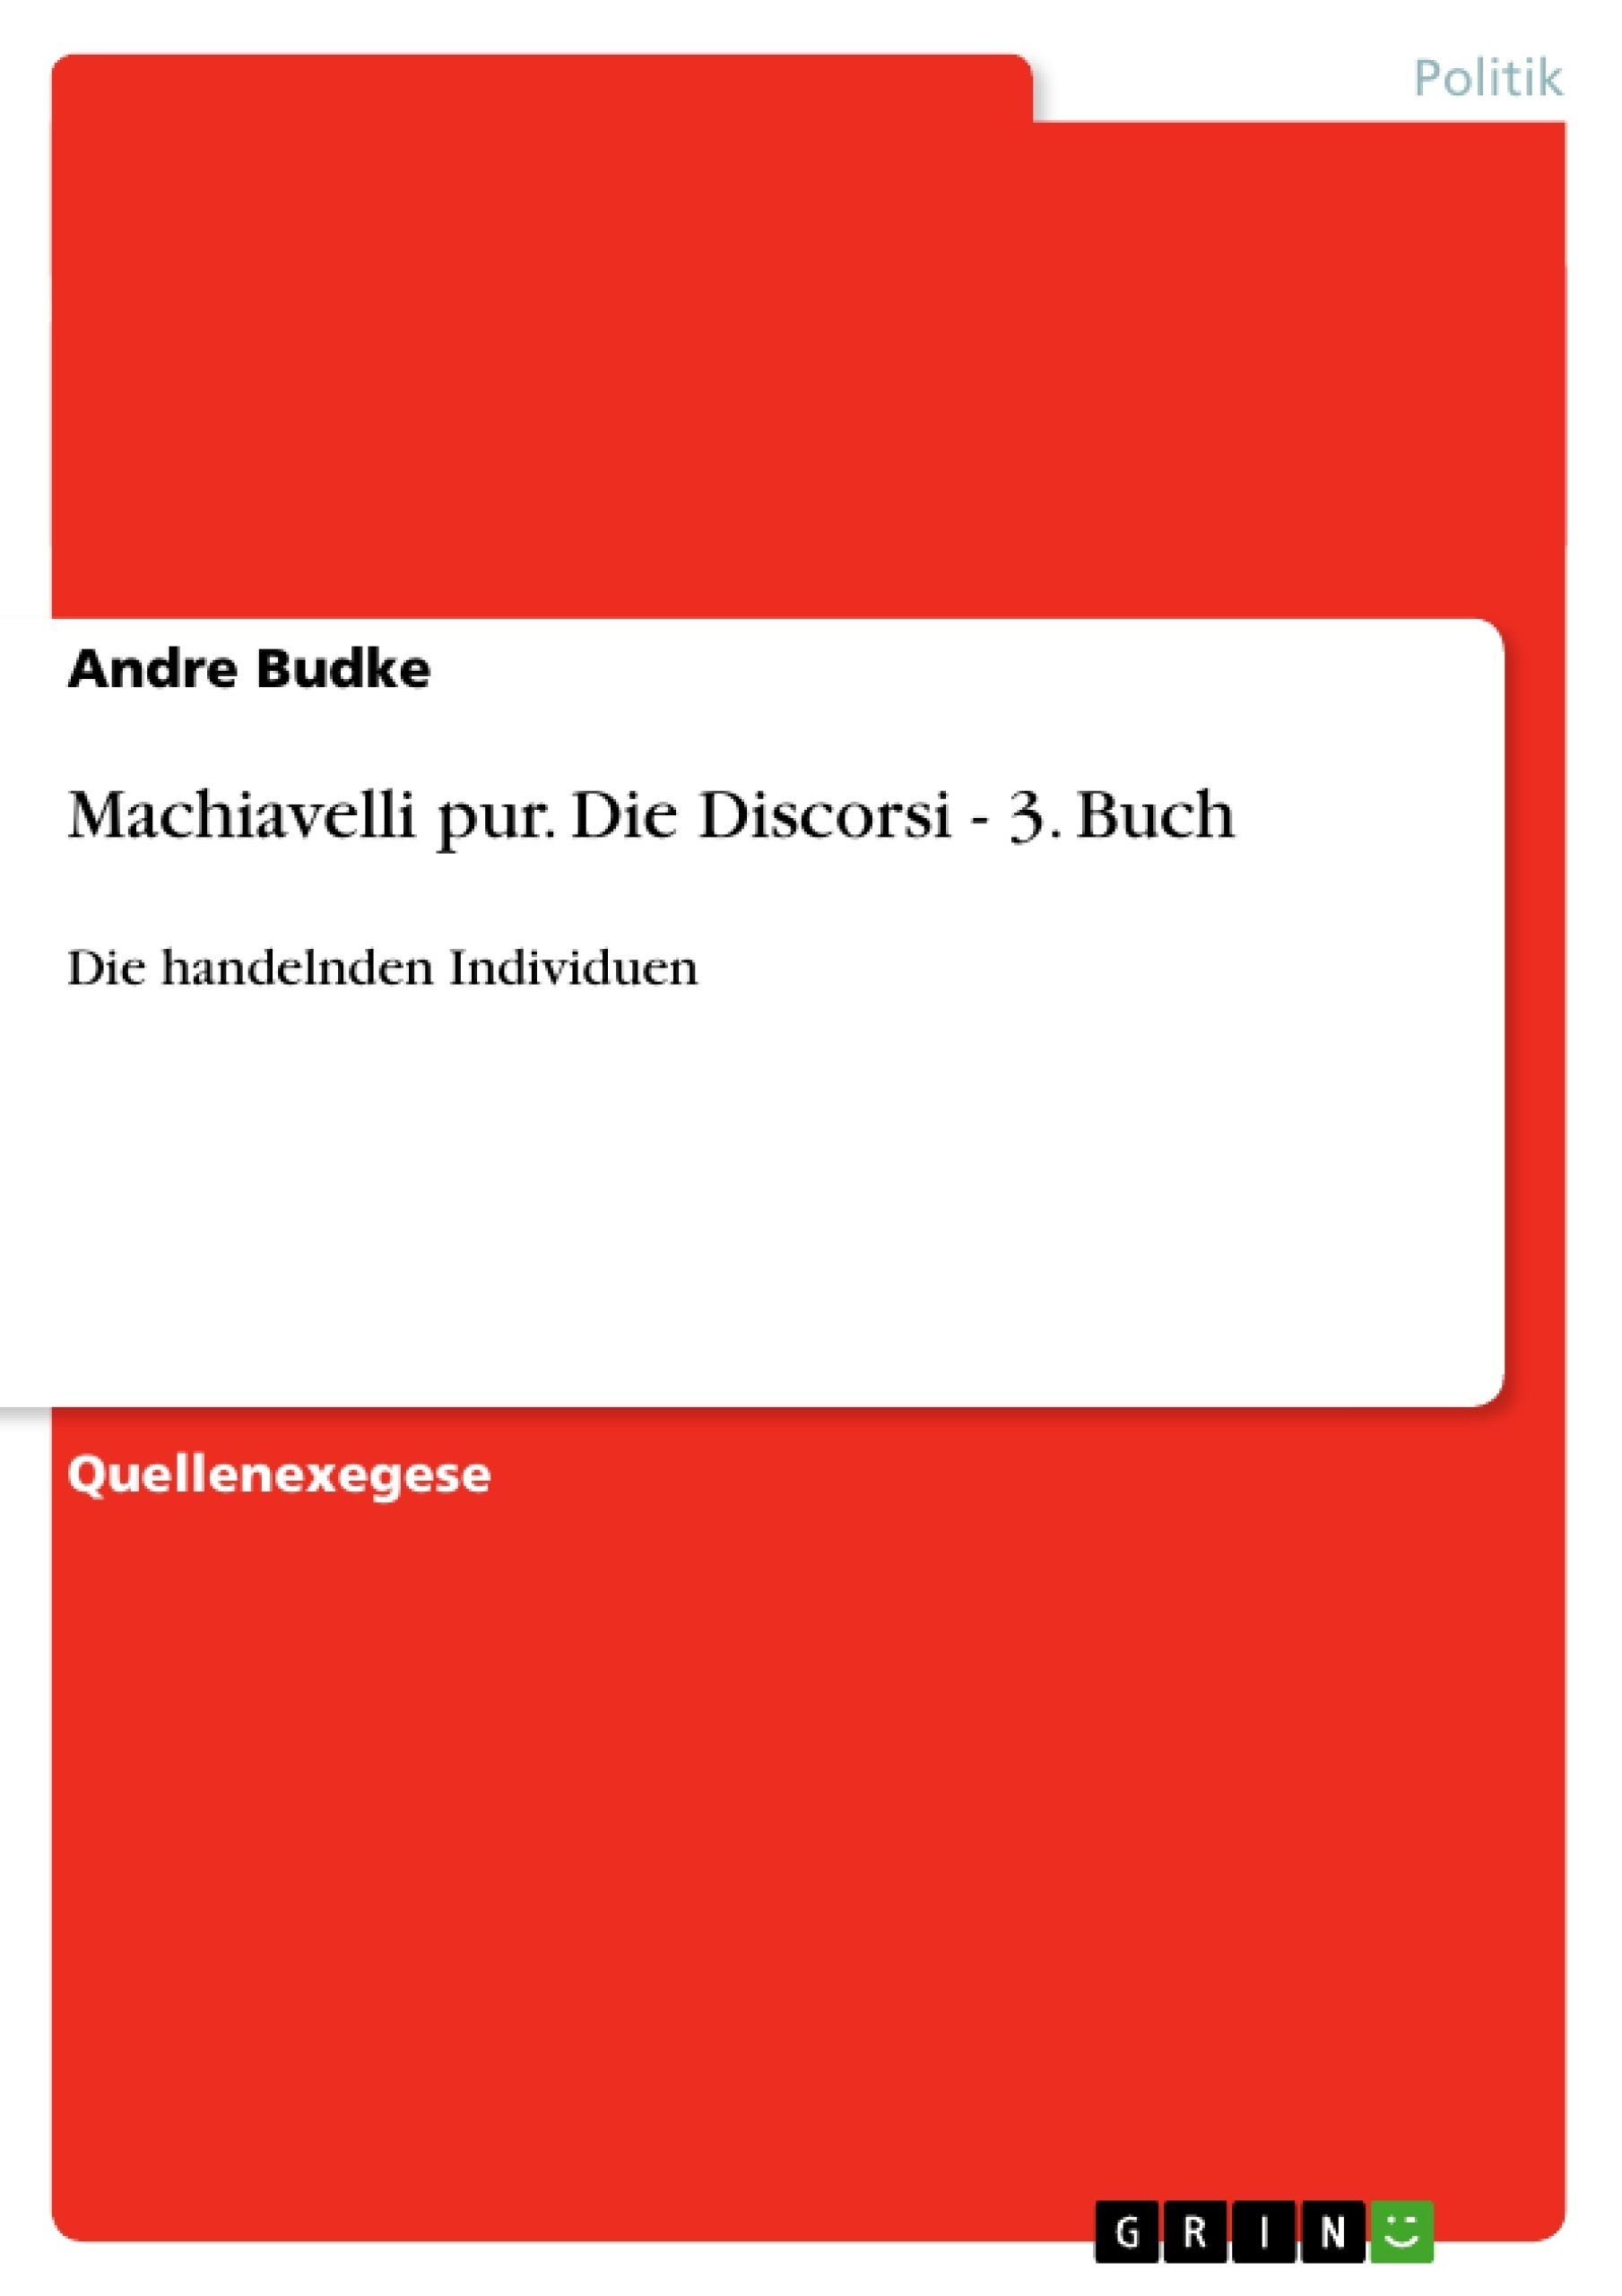 Titel: Machiavelli pur. Die Discorsi - 3. Buch